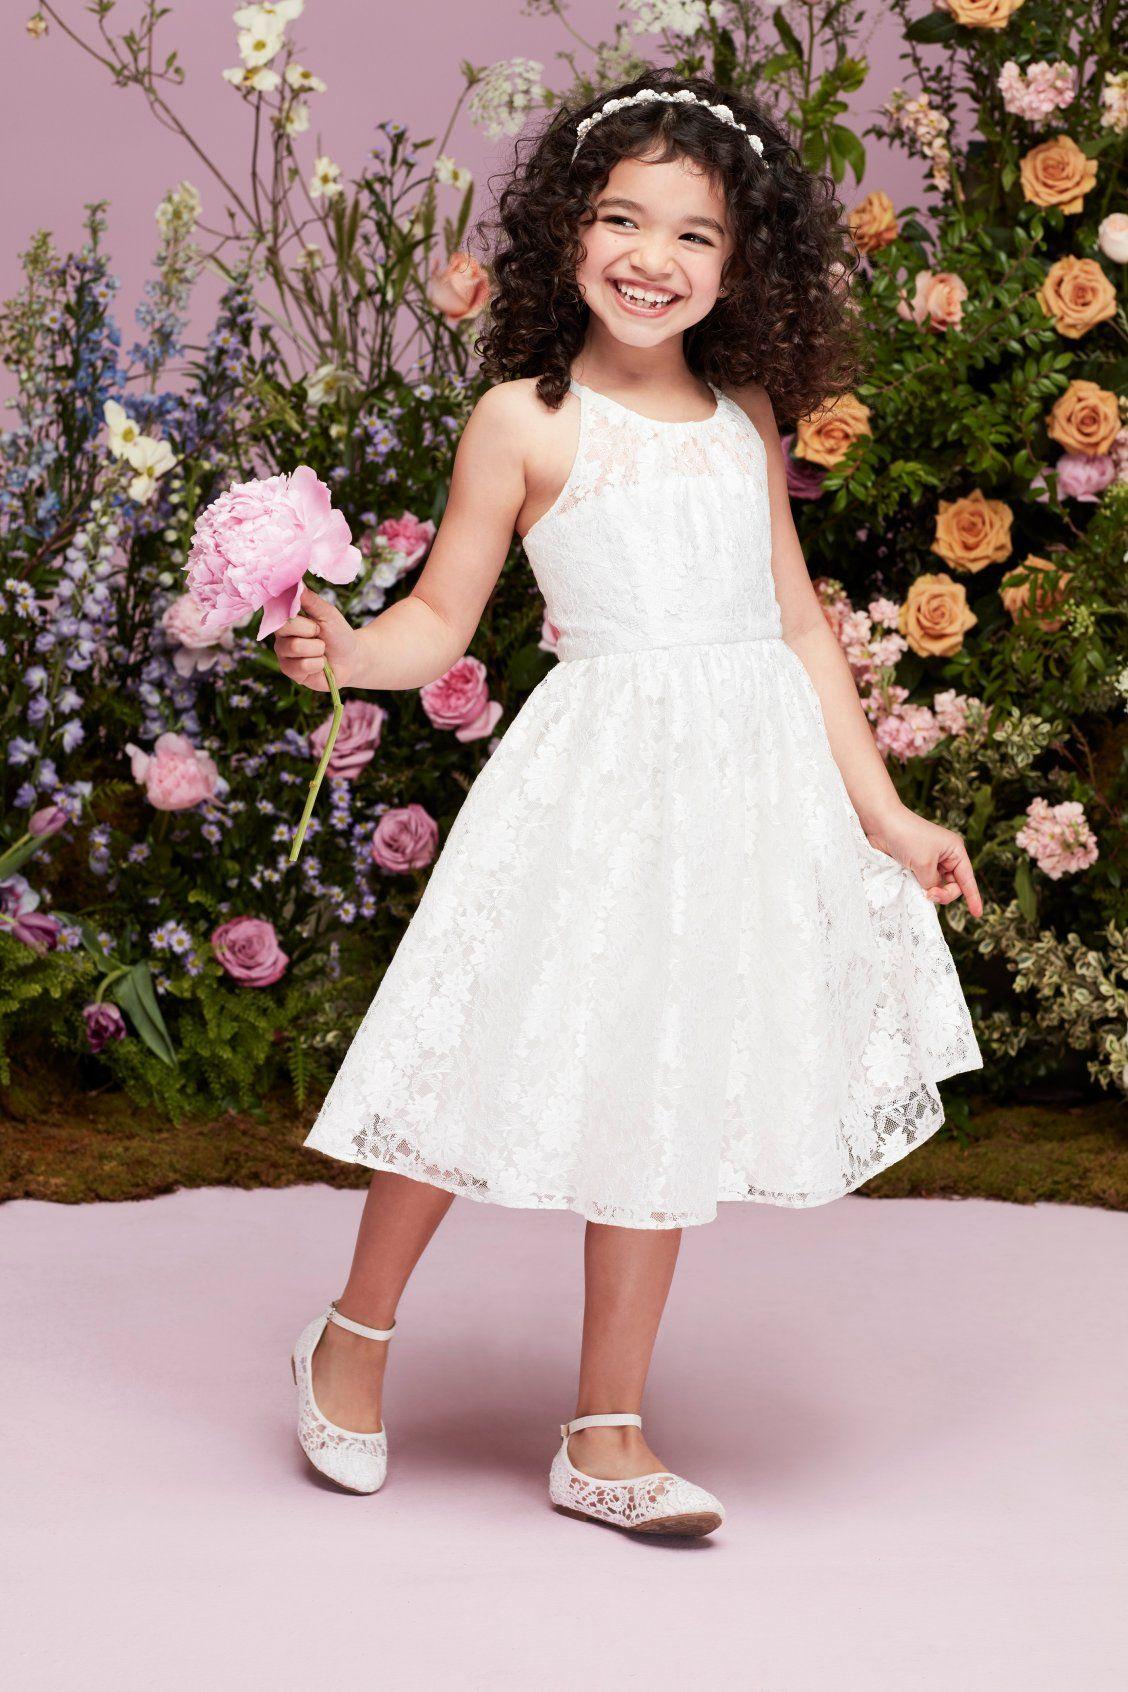 Illusion Lace Tie-Back Halter Flower Girl Dress | Flower ...